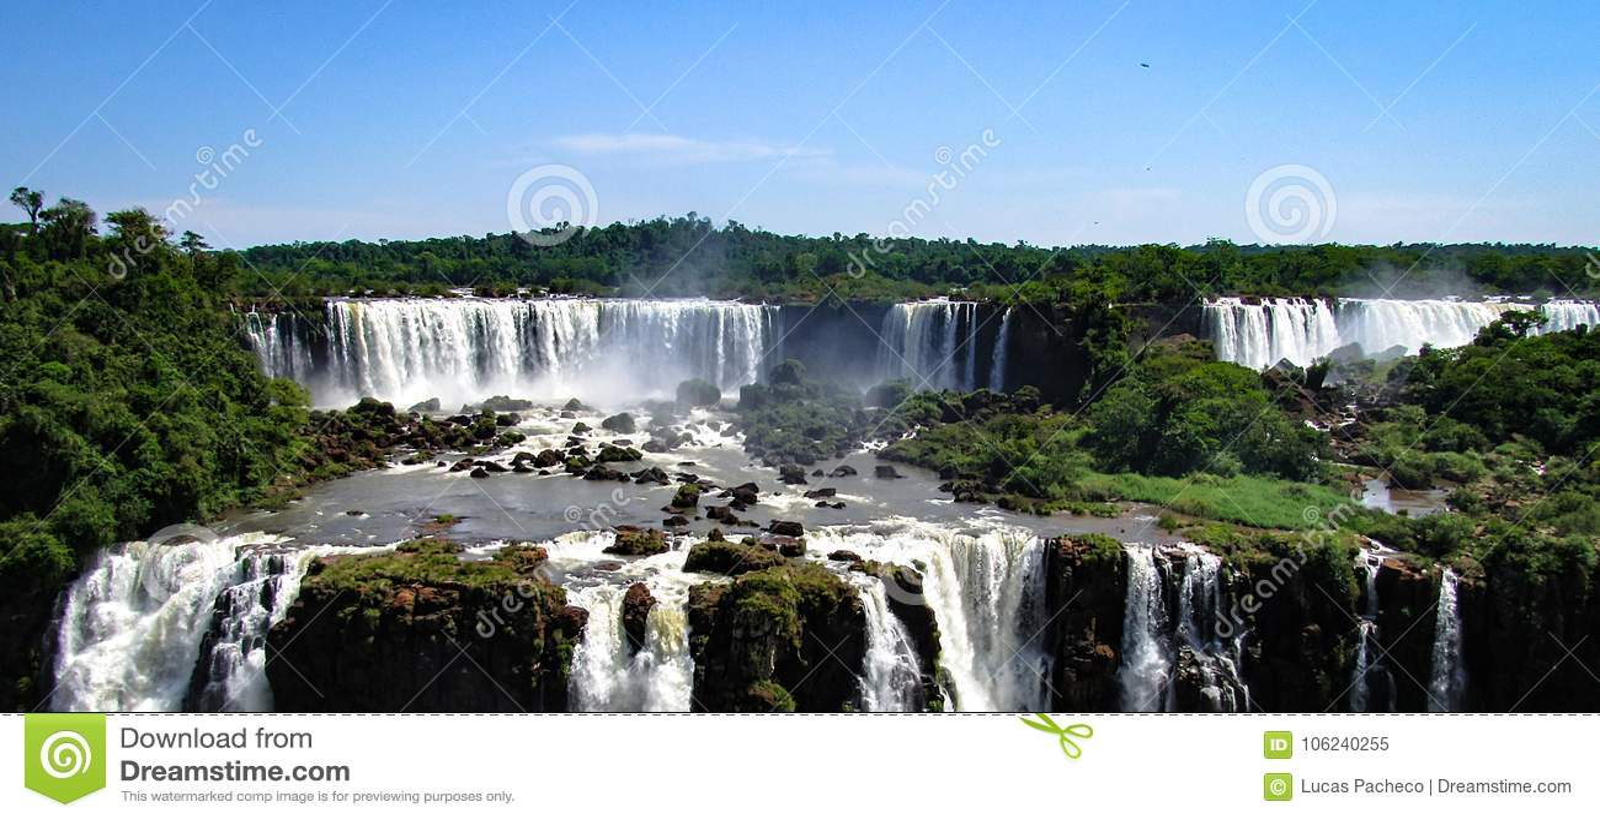 De Braziliaanse Kant van Iguazu valt, in Foz doe Iguacu, Brazilië